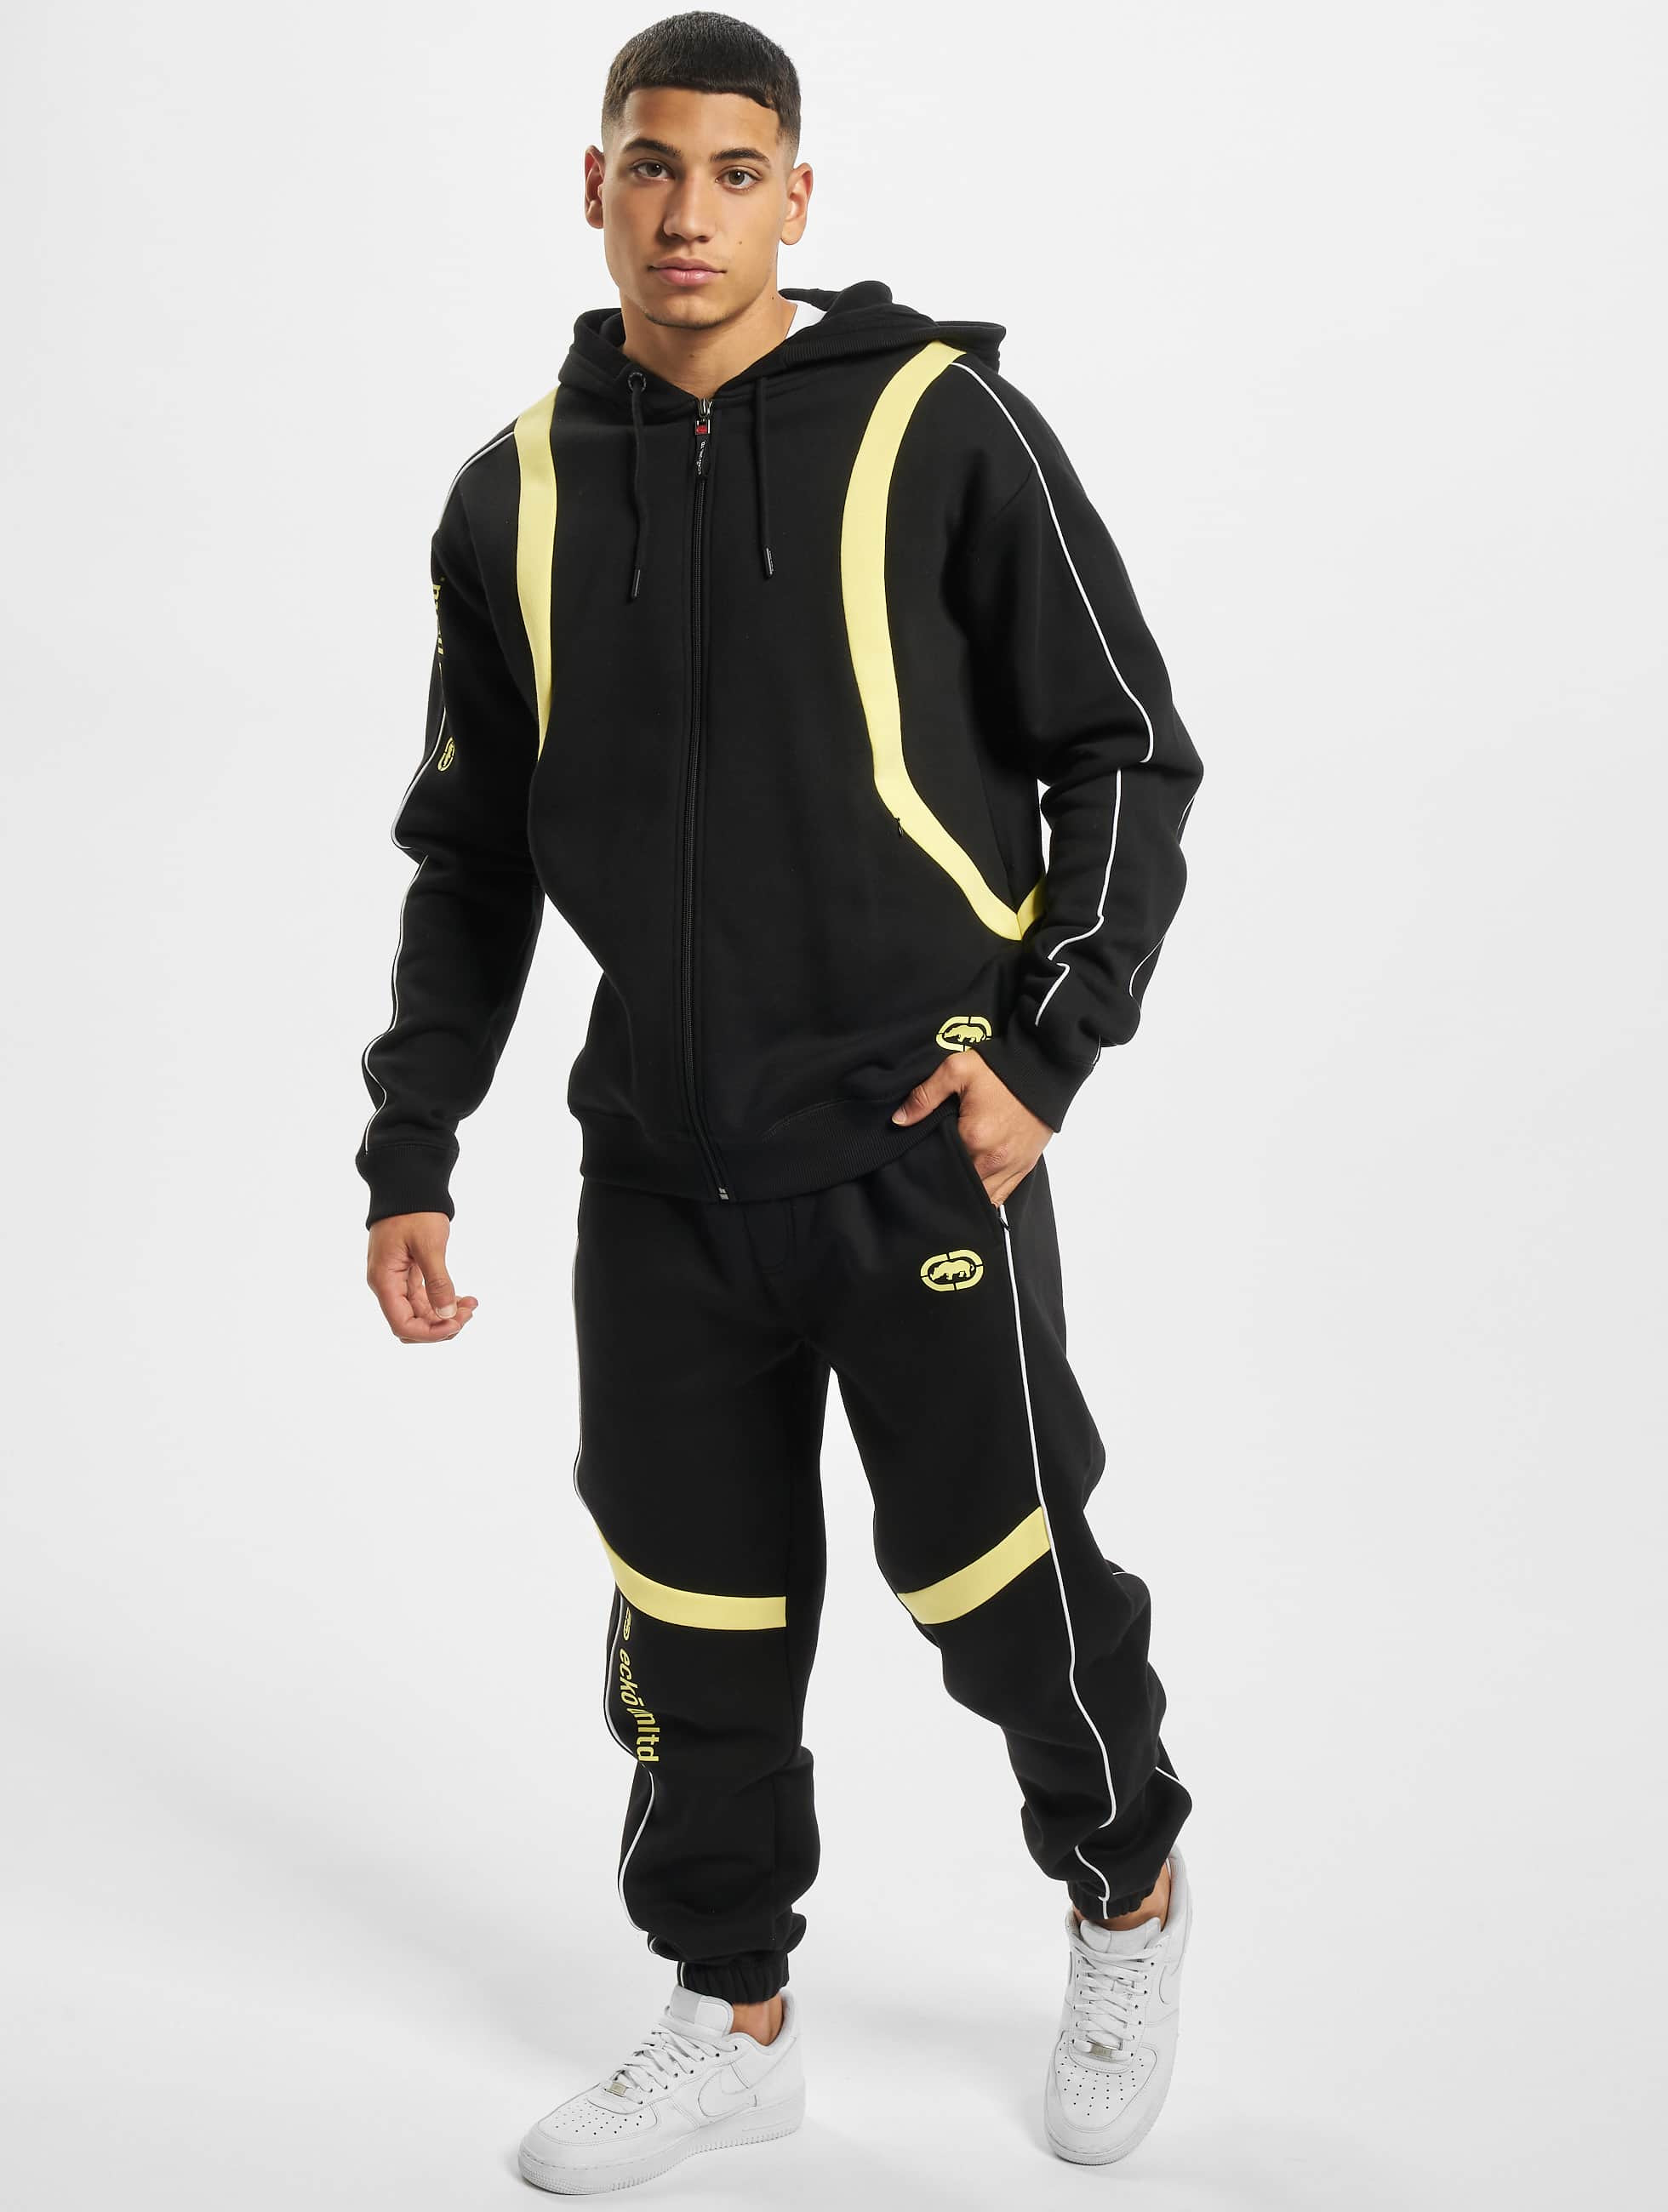 Ecko Unltd. / Suits Richmond in black S